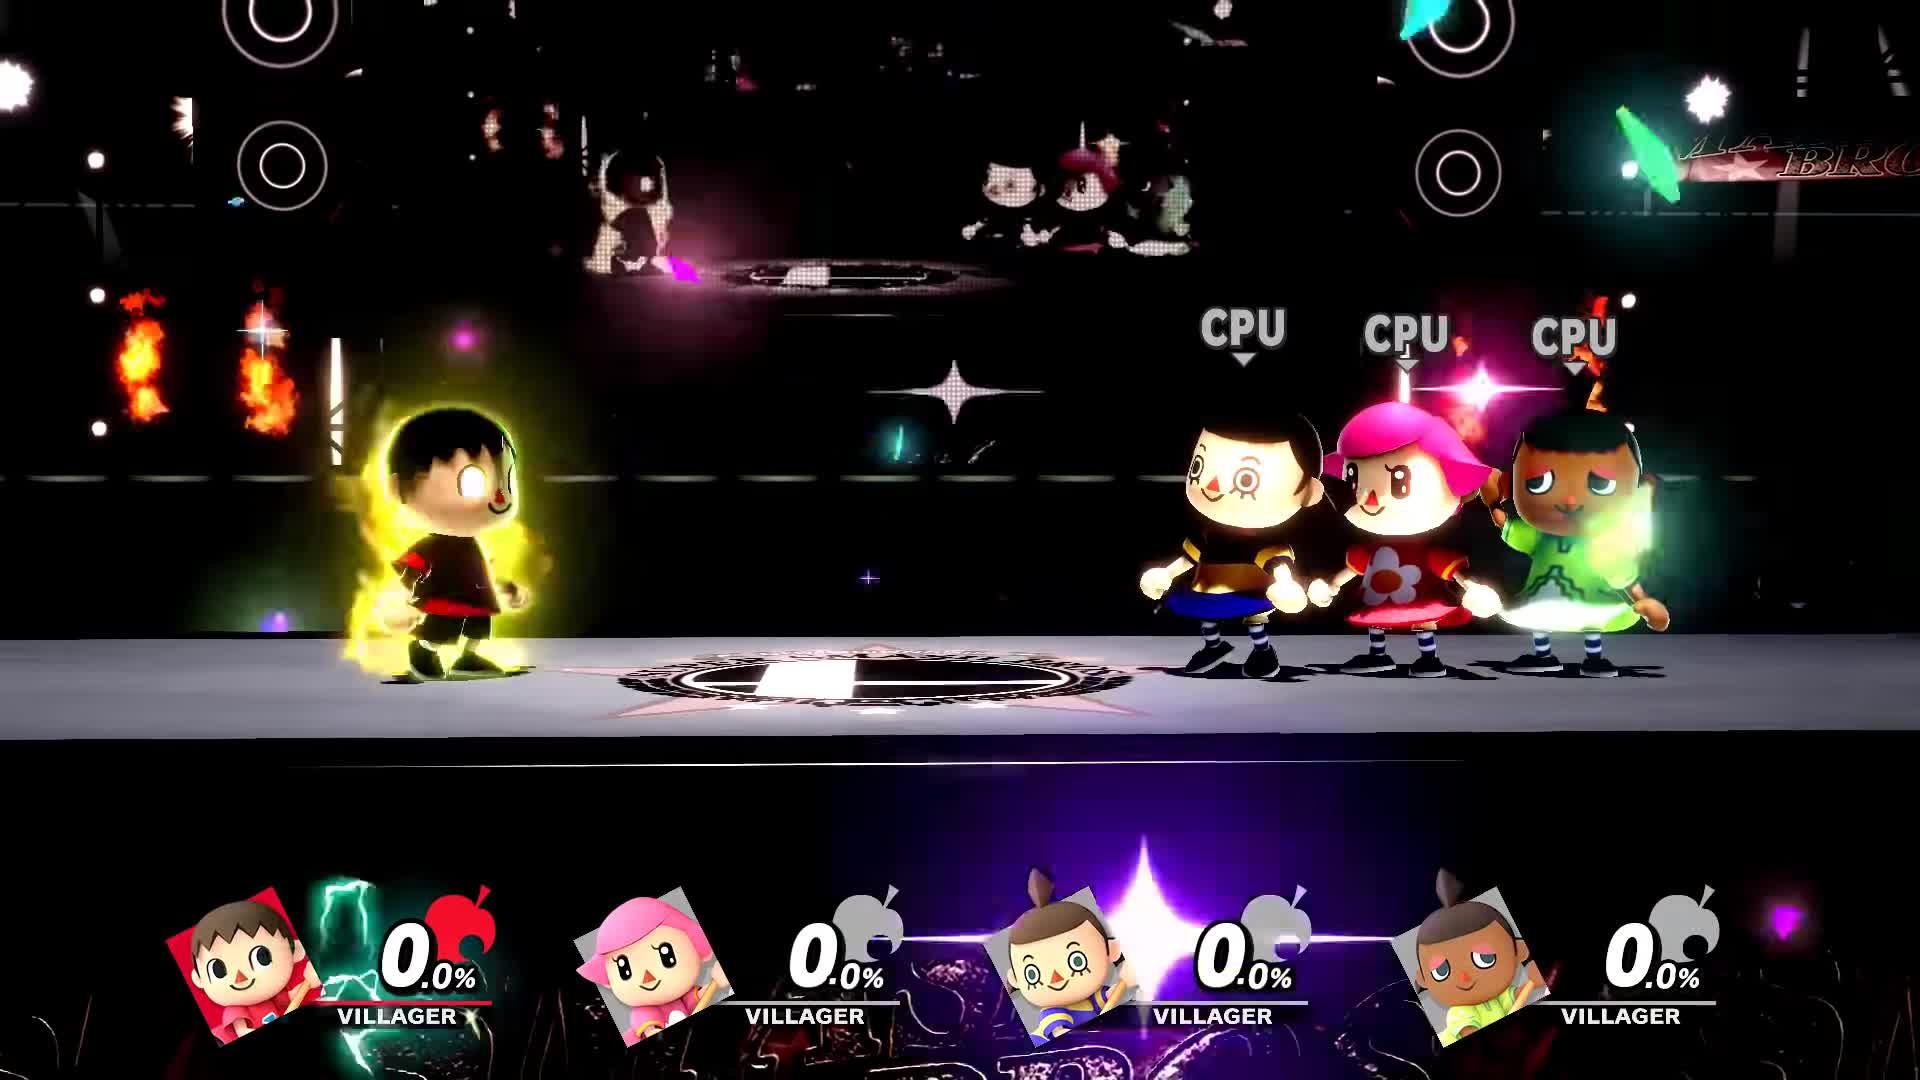 Gaming, KokiriGaming, all, all final smashes, characters, final smashes, mario, smash bros, super smash bros, super smash bros ultimate, Super Smash Bros. Ultimate - Villager Final Smash (aka Villager Uses Capitalism) GIFs